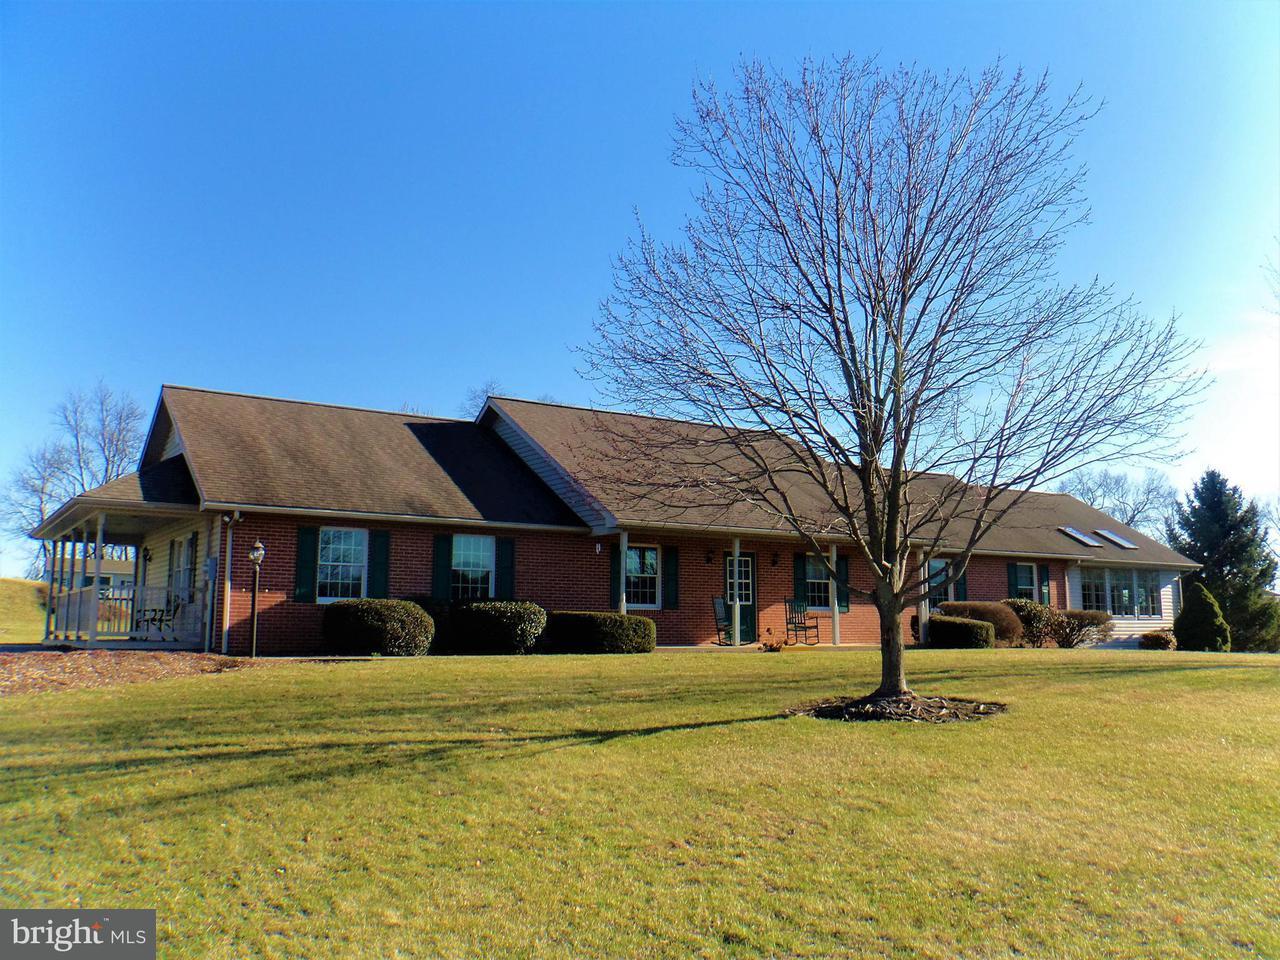 Single Family Home for Sale at 12588 Garnes Road 12588 Garnes Road Mercersburg, Pennsylvania 17236 United States